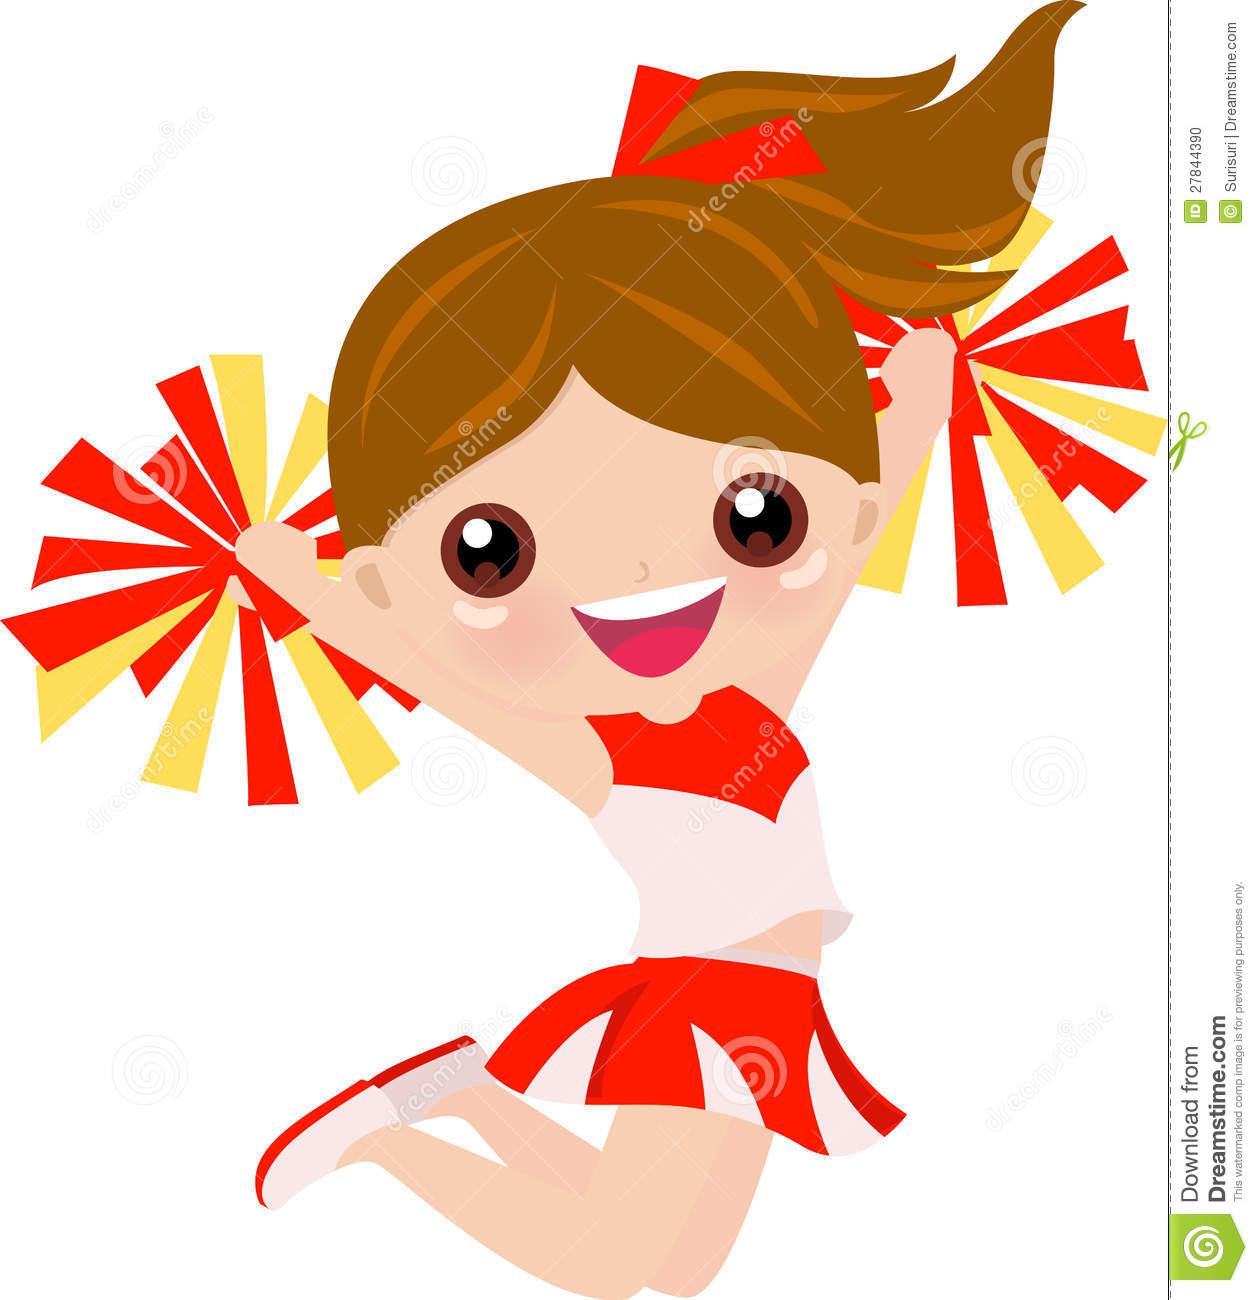 hight resolution of 1258x1300 pictures of cartoon cheerleaders